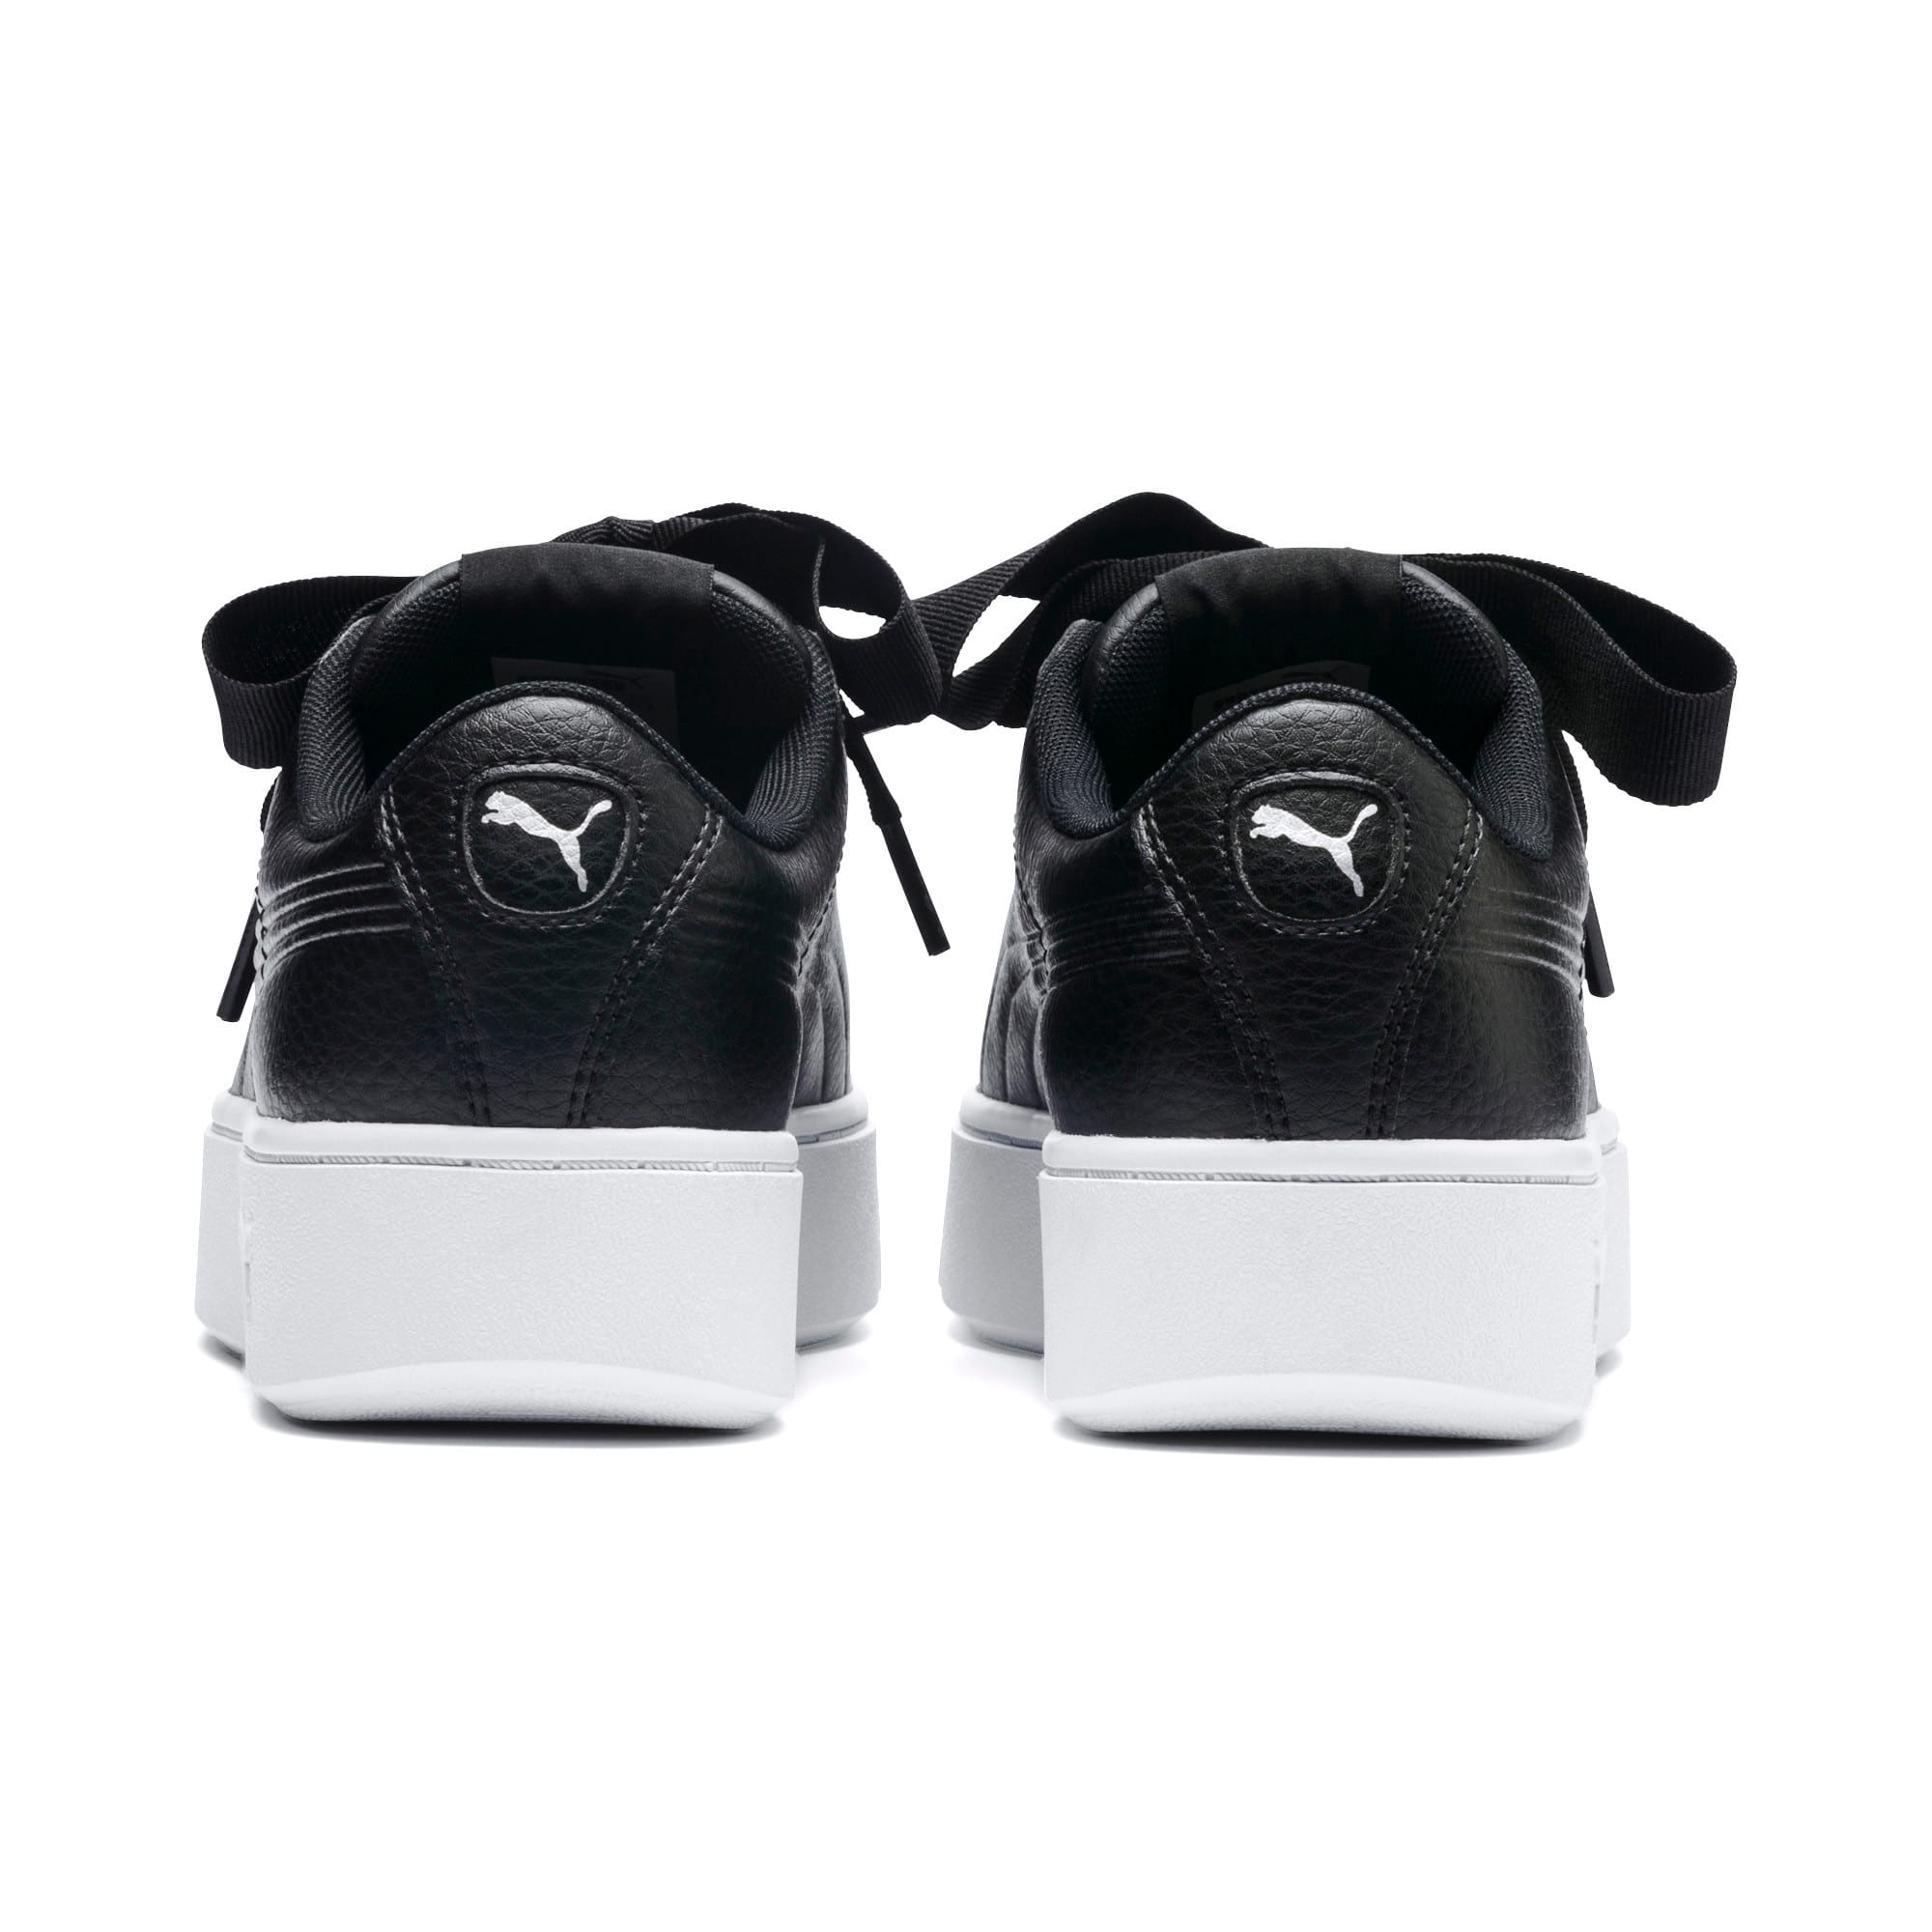 Thumbnail 3 of PUMA Vikky Stacked Ribbon Core Women's Sneakers, Puma Black-Puma Black, medium